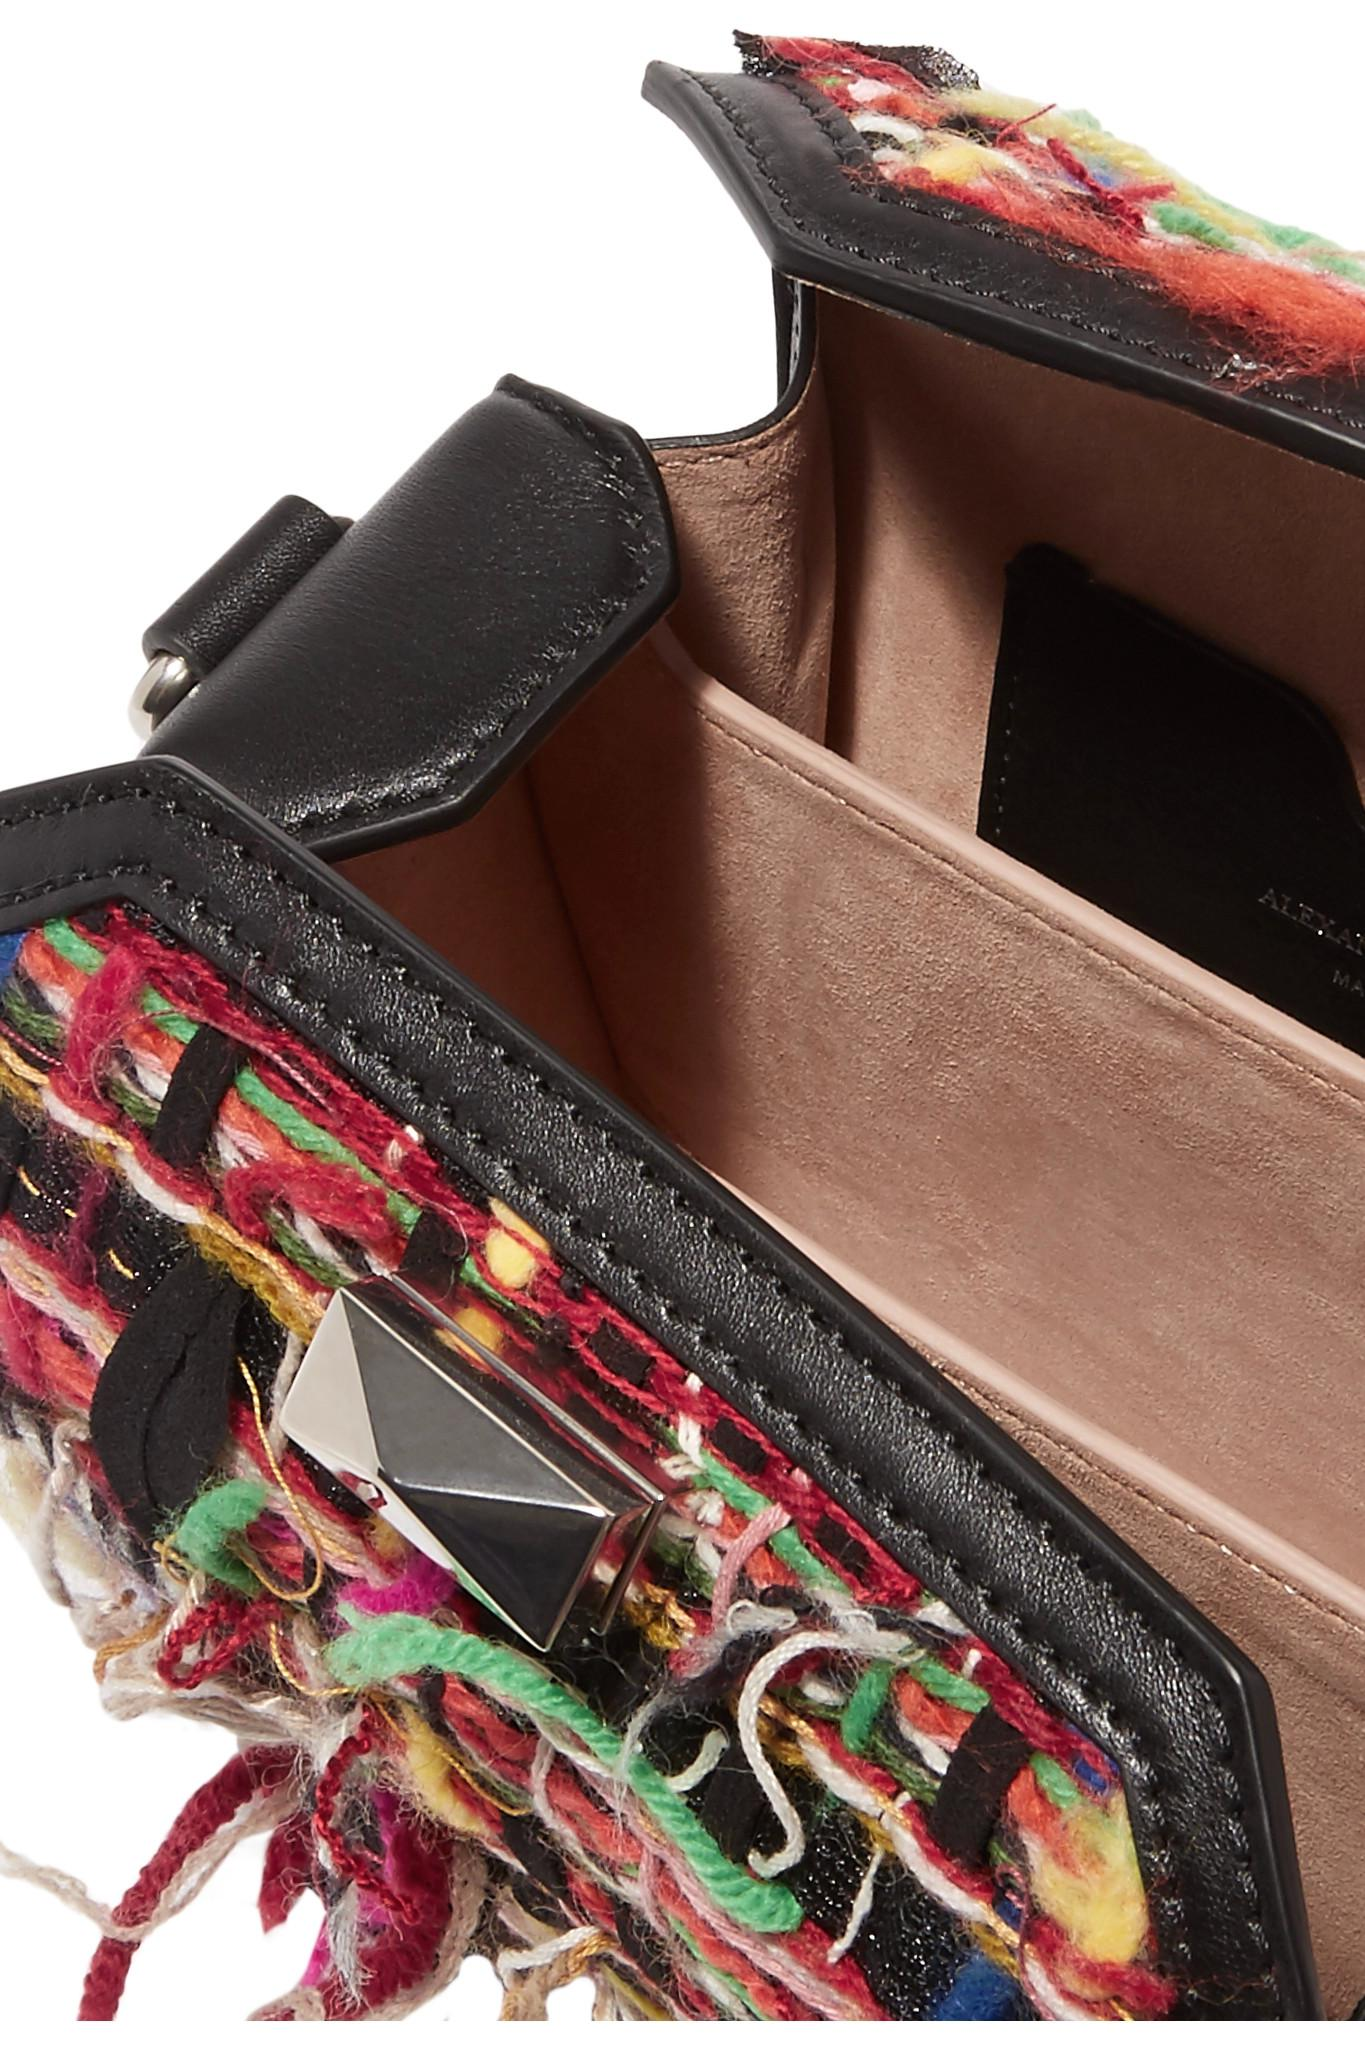 Box Bag 16 Small Fringed Tweed Shoulder Bag - Red Alexander McQueen 7fAQbZt